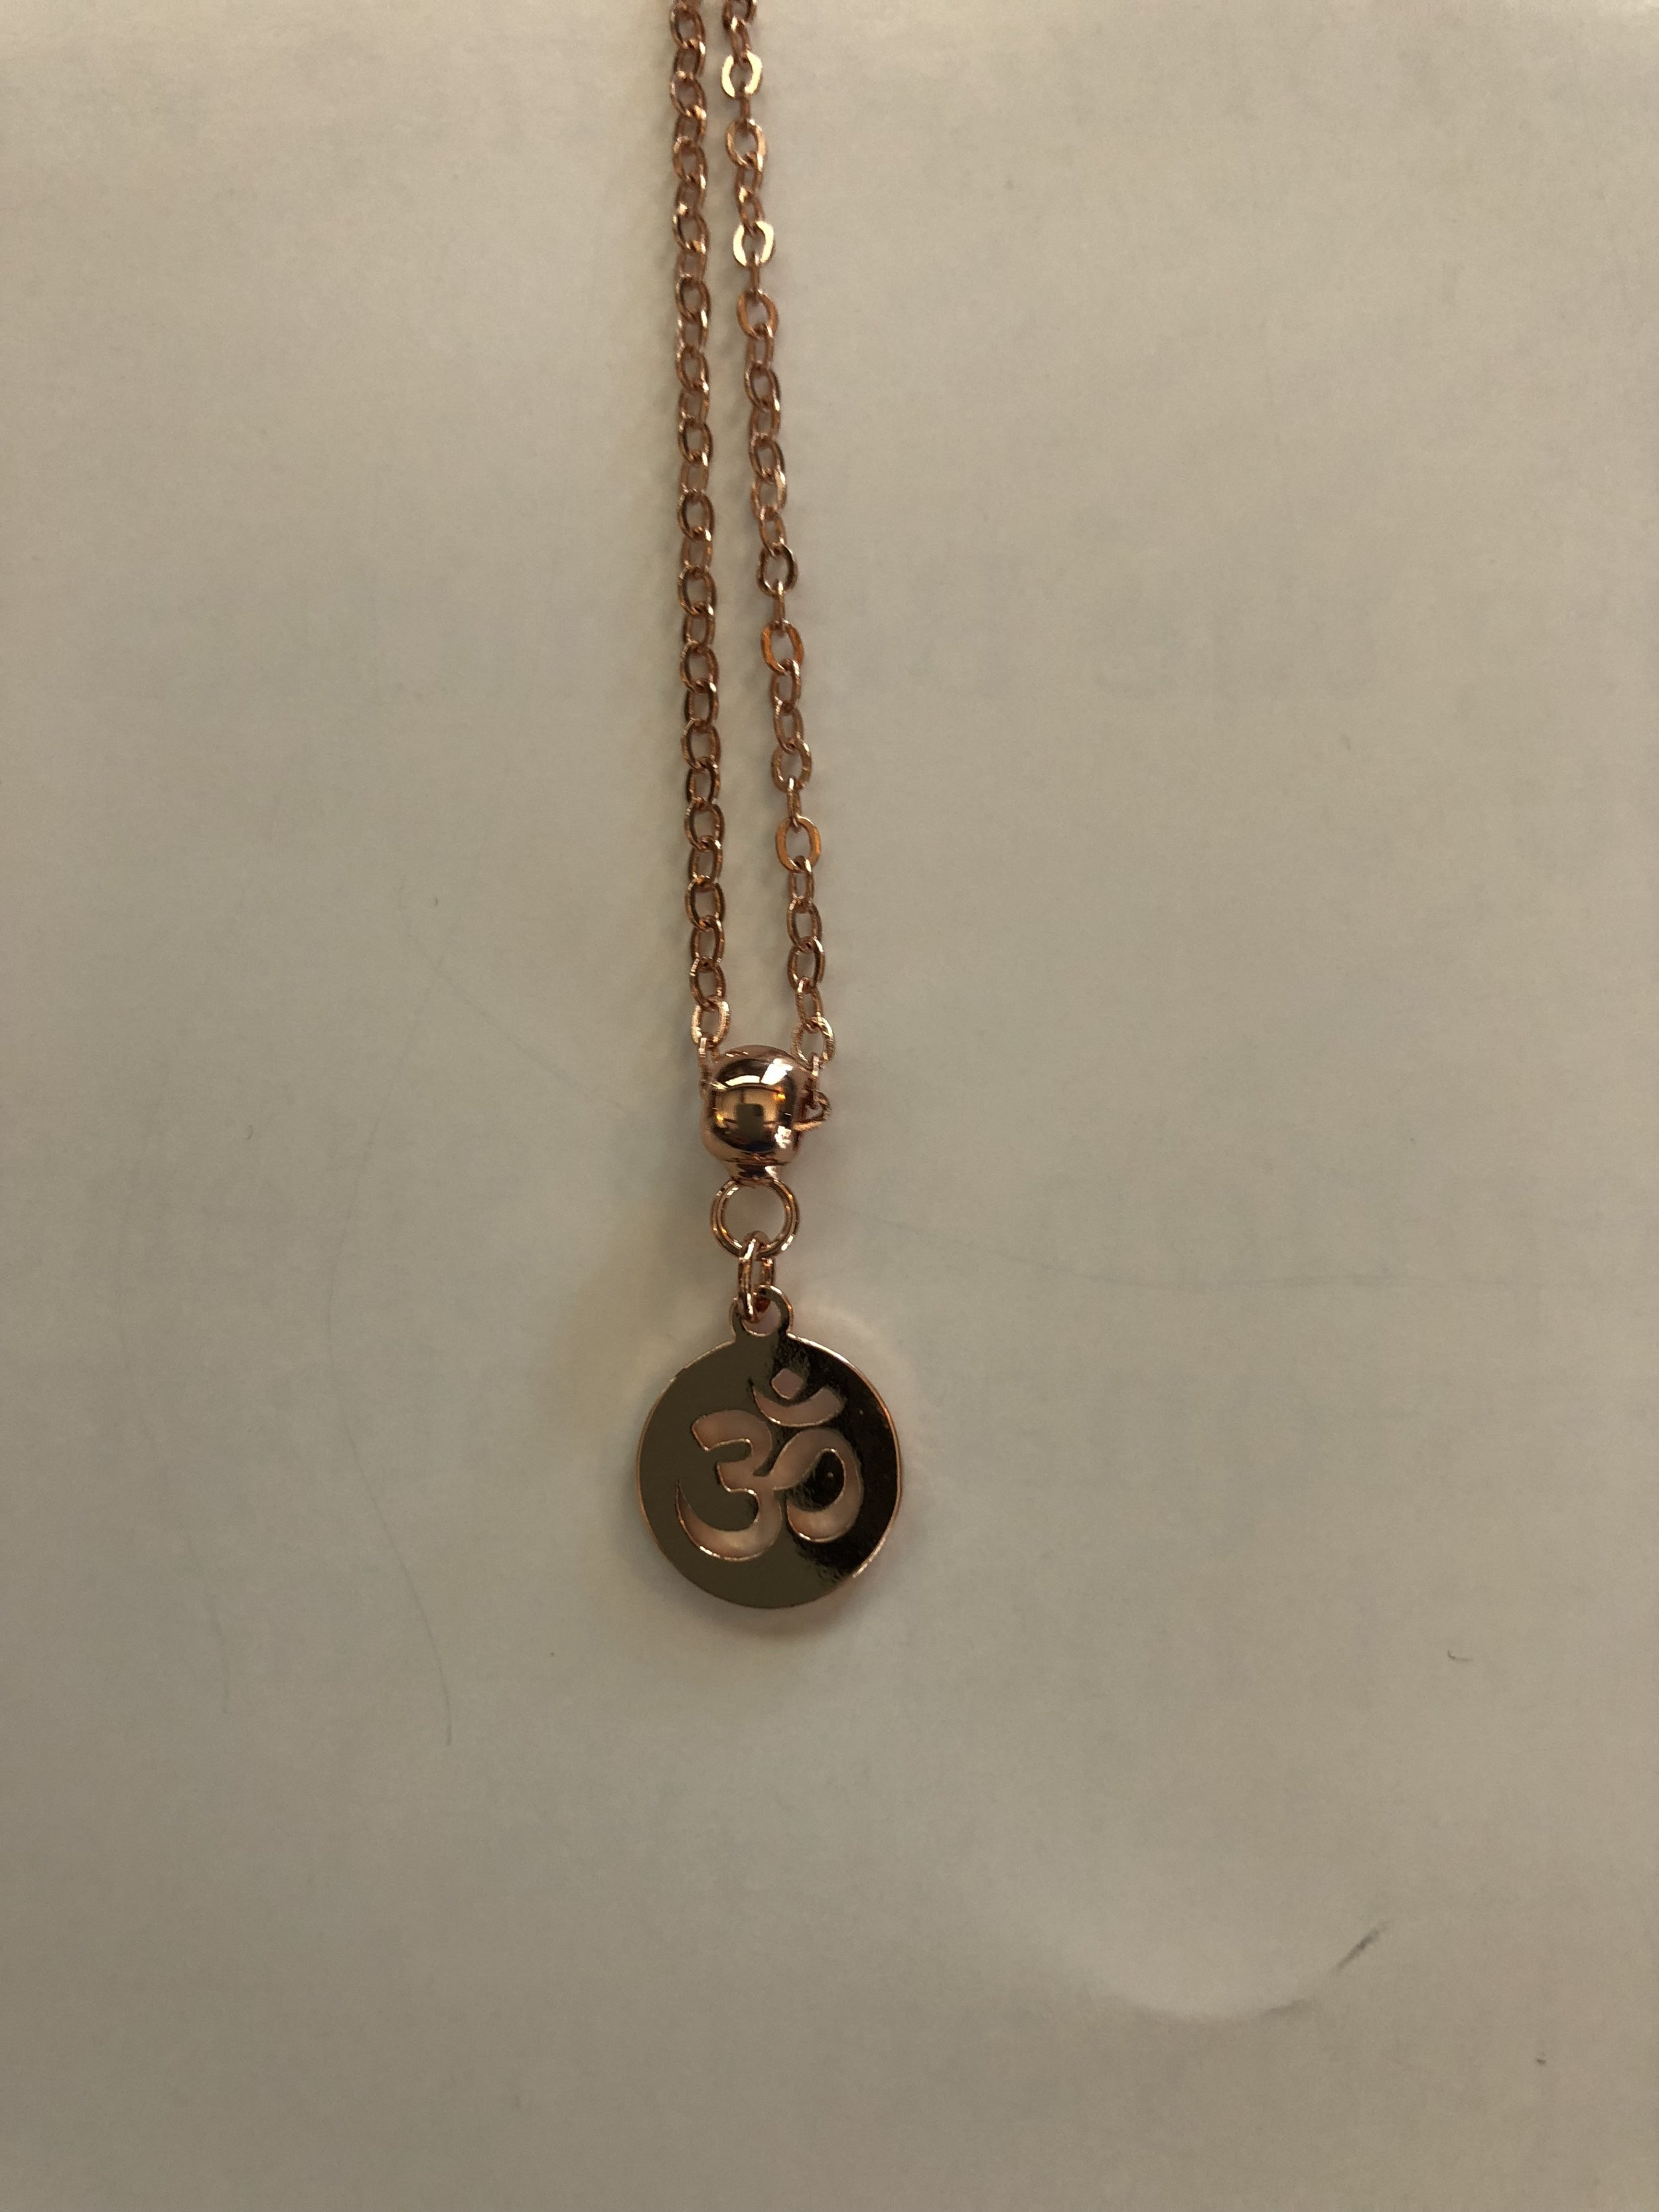 Om rose necklace, gold plated